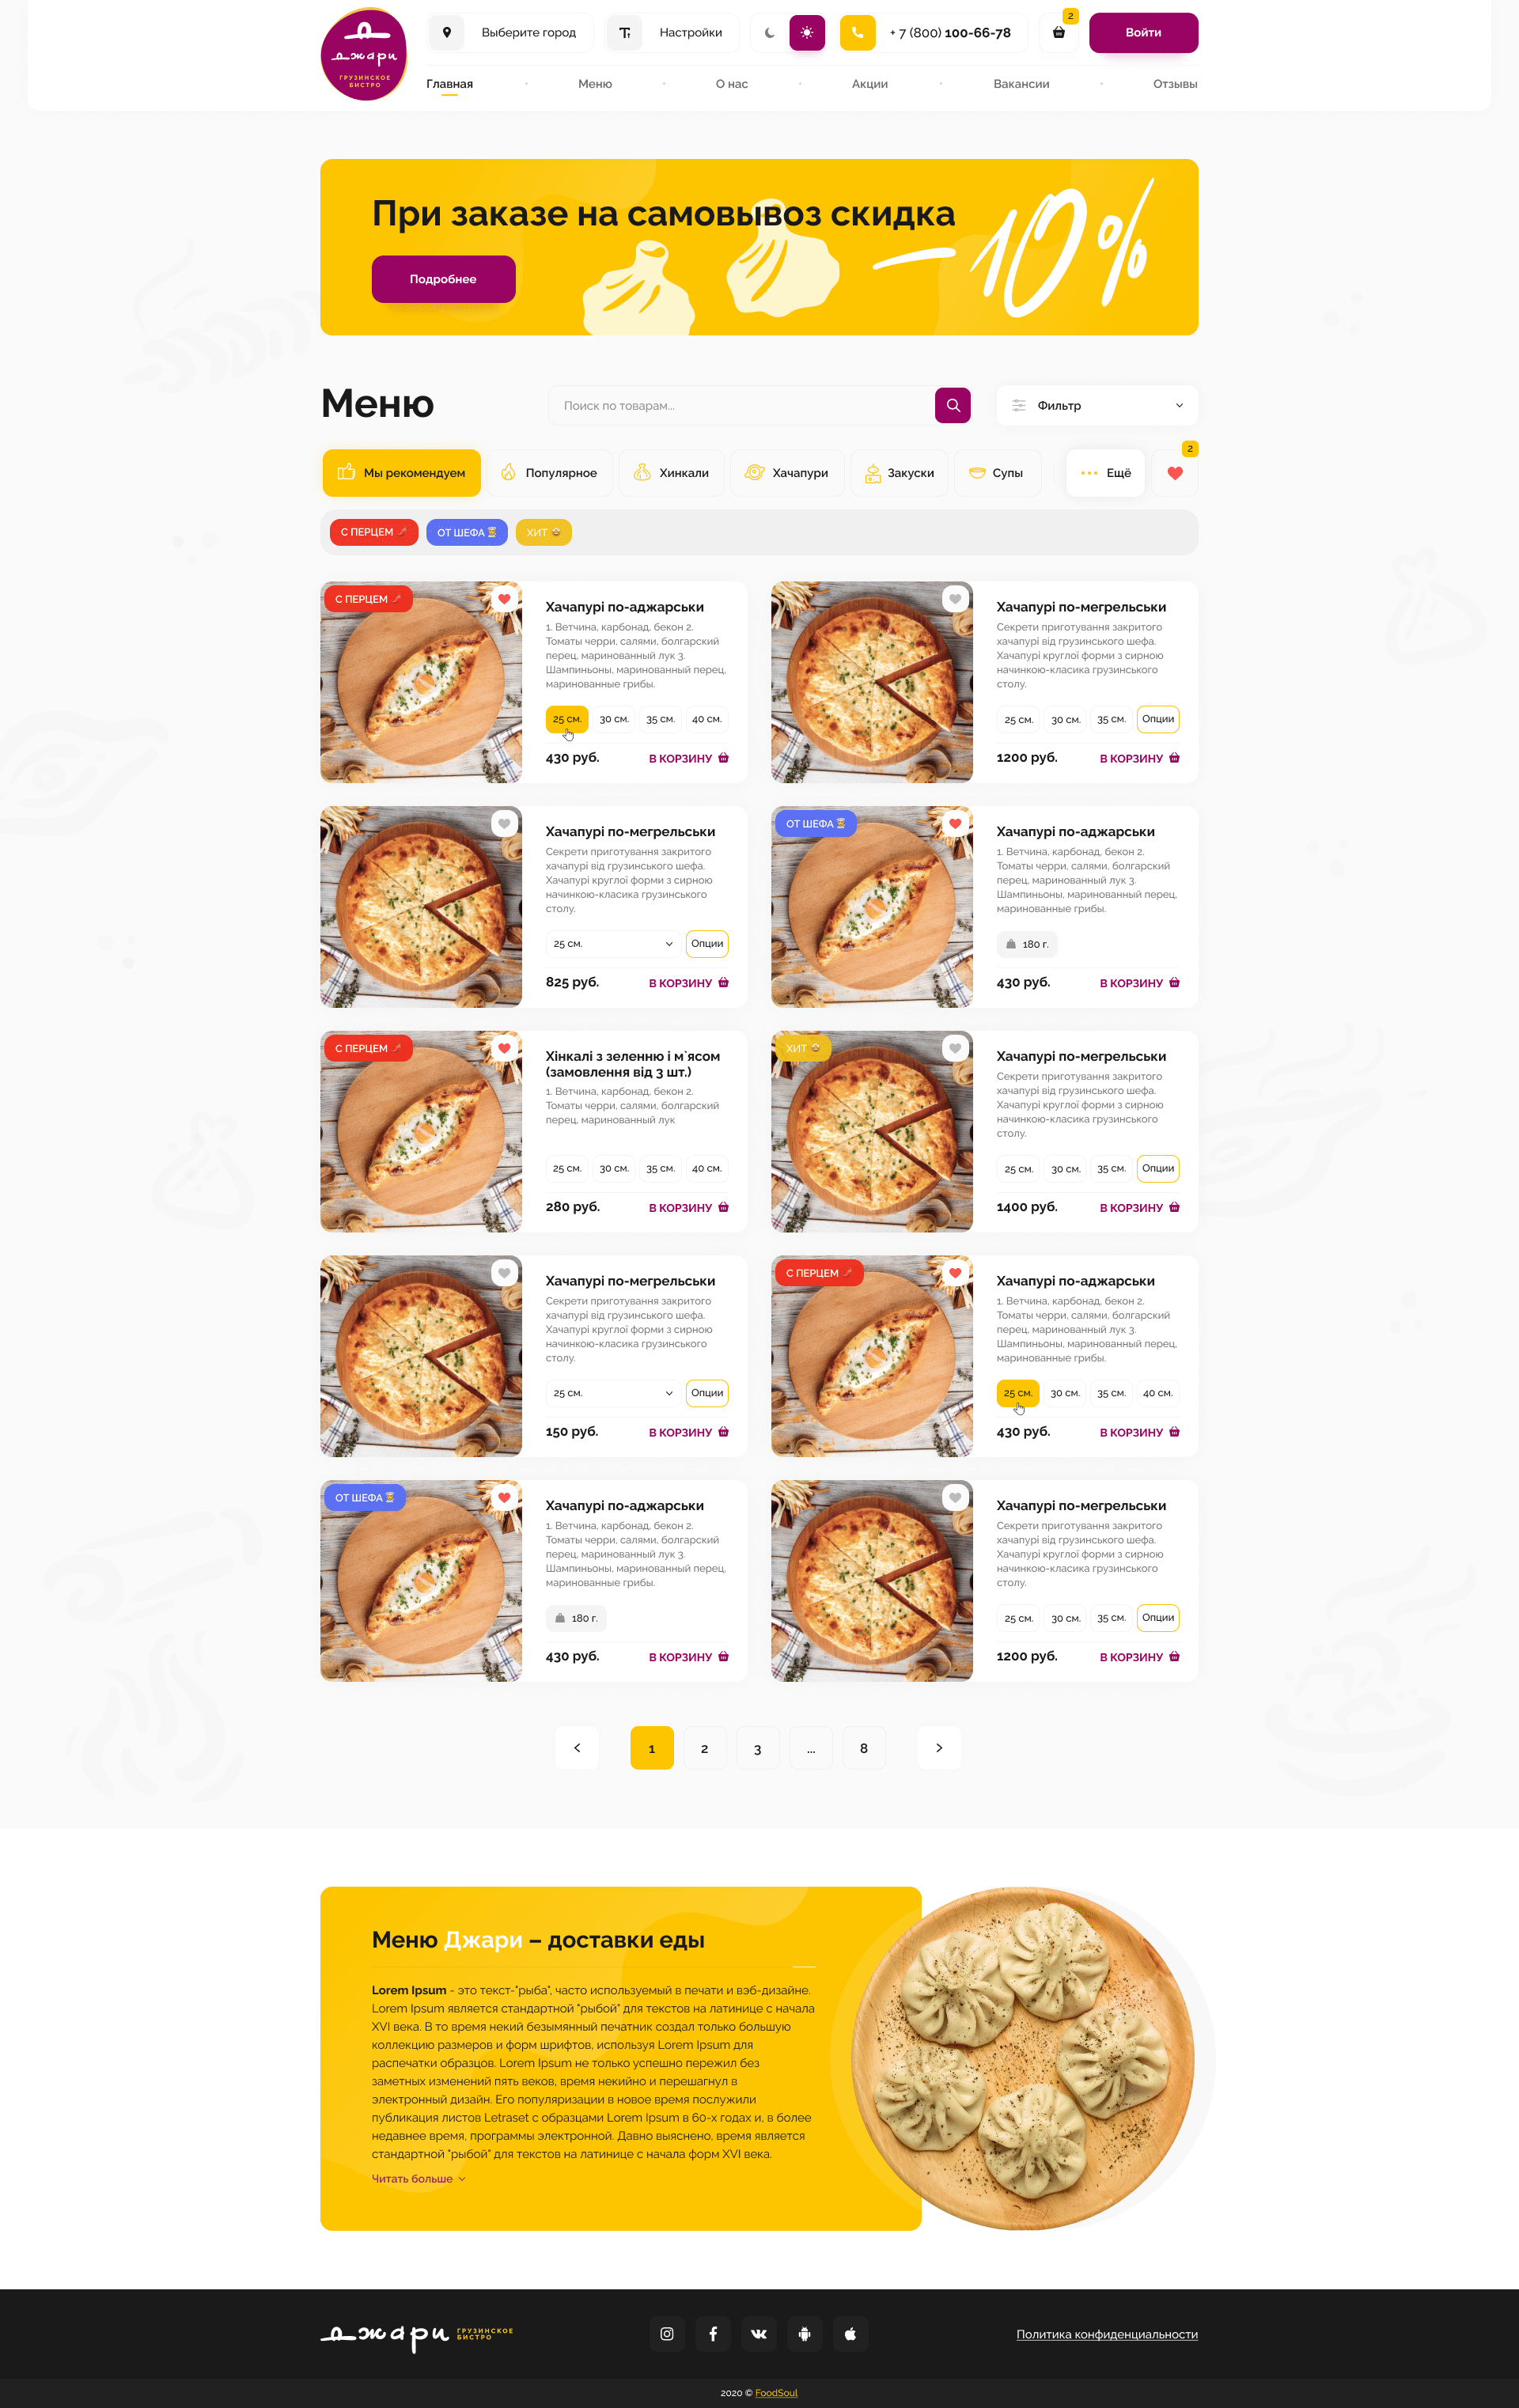 FoodSoul_02_Catalog_Page_1.0